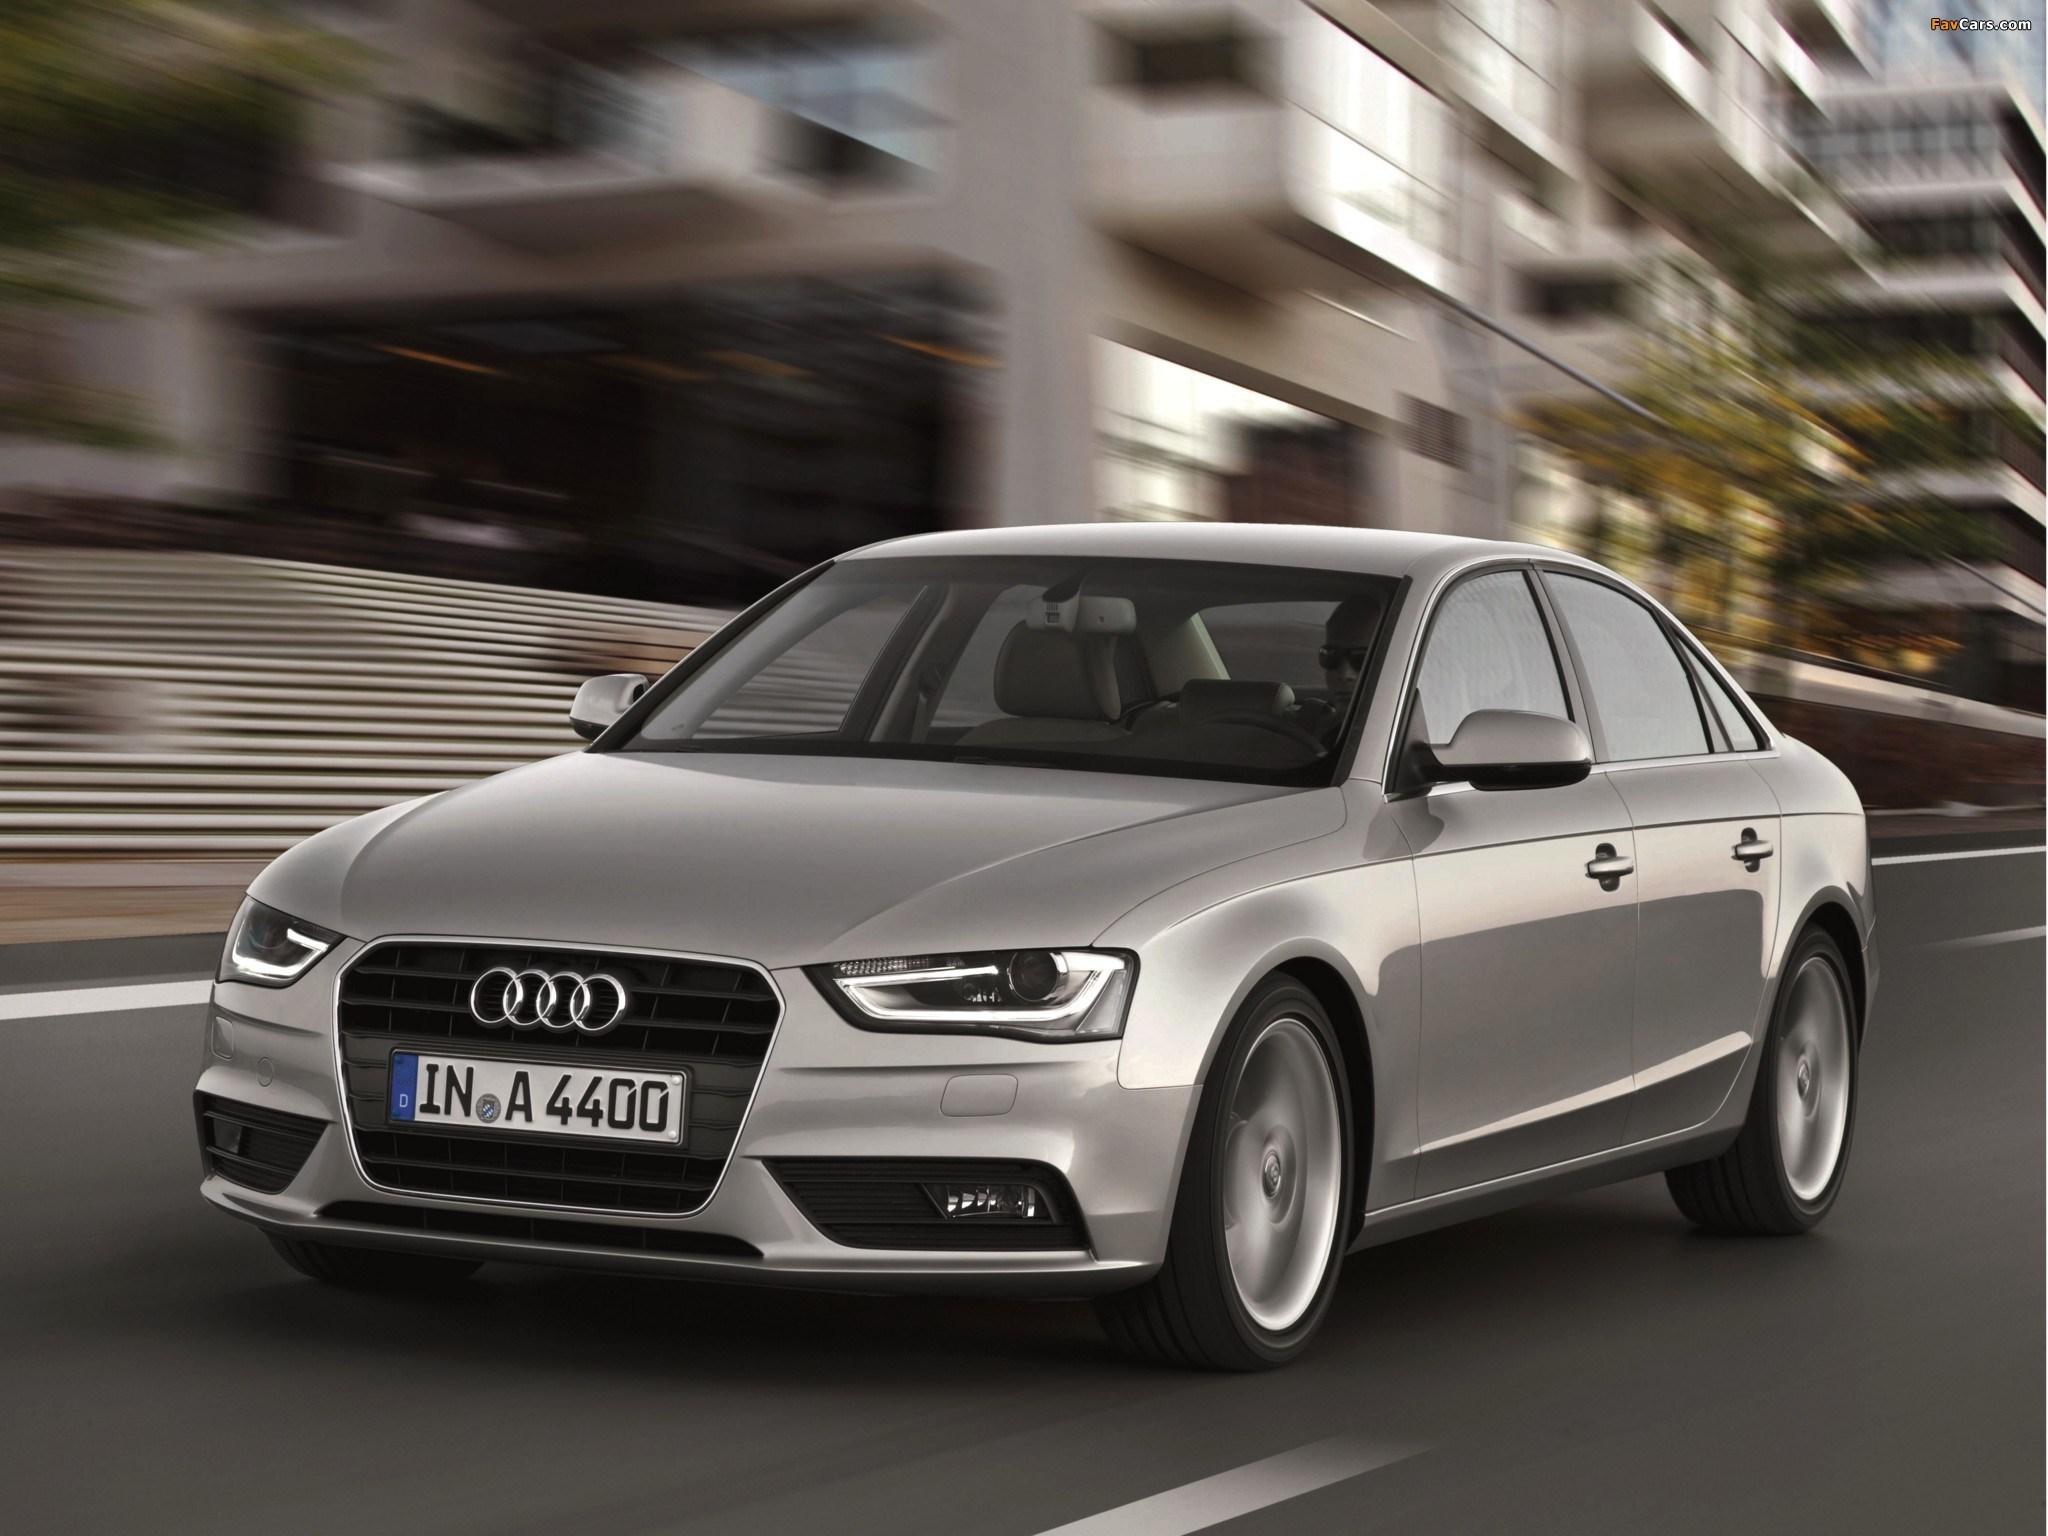 Audi A4 B8 Wallpaper Free Download 64 Cerc Ug Org - Audi A4 S Line 2013 Silver , HD Wallpaper & Backgrounds